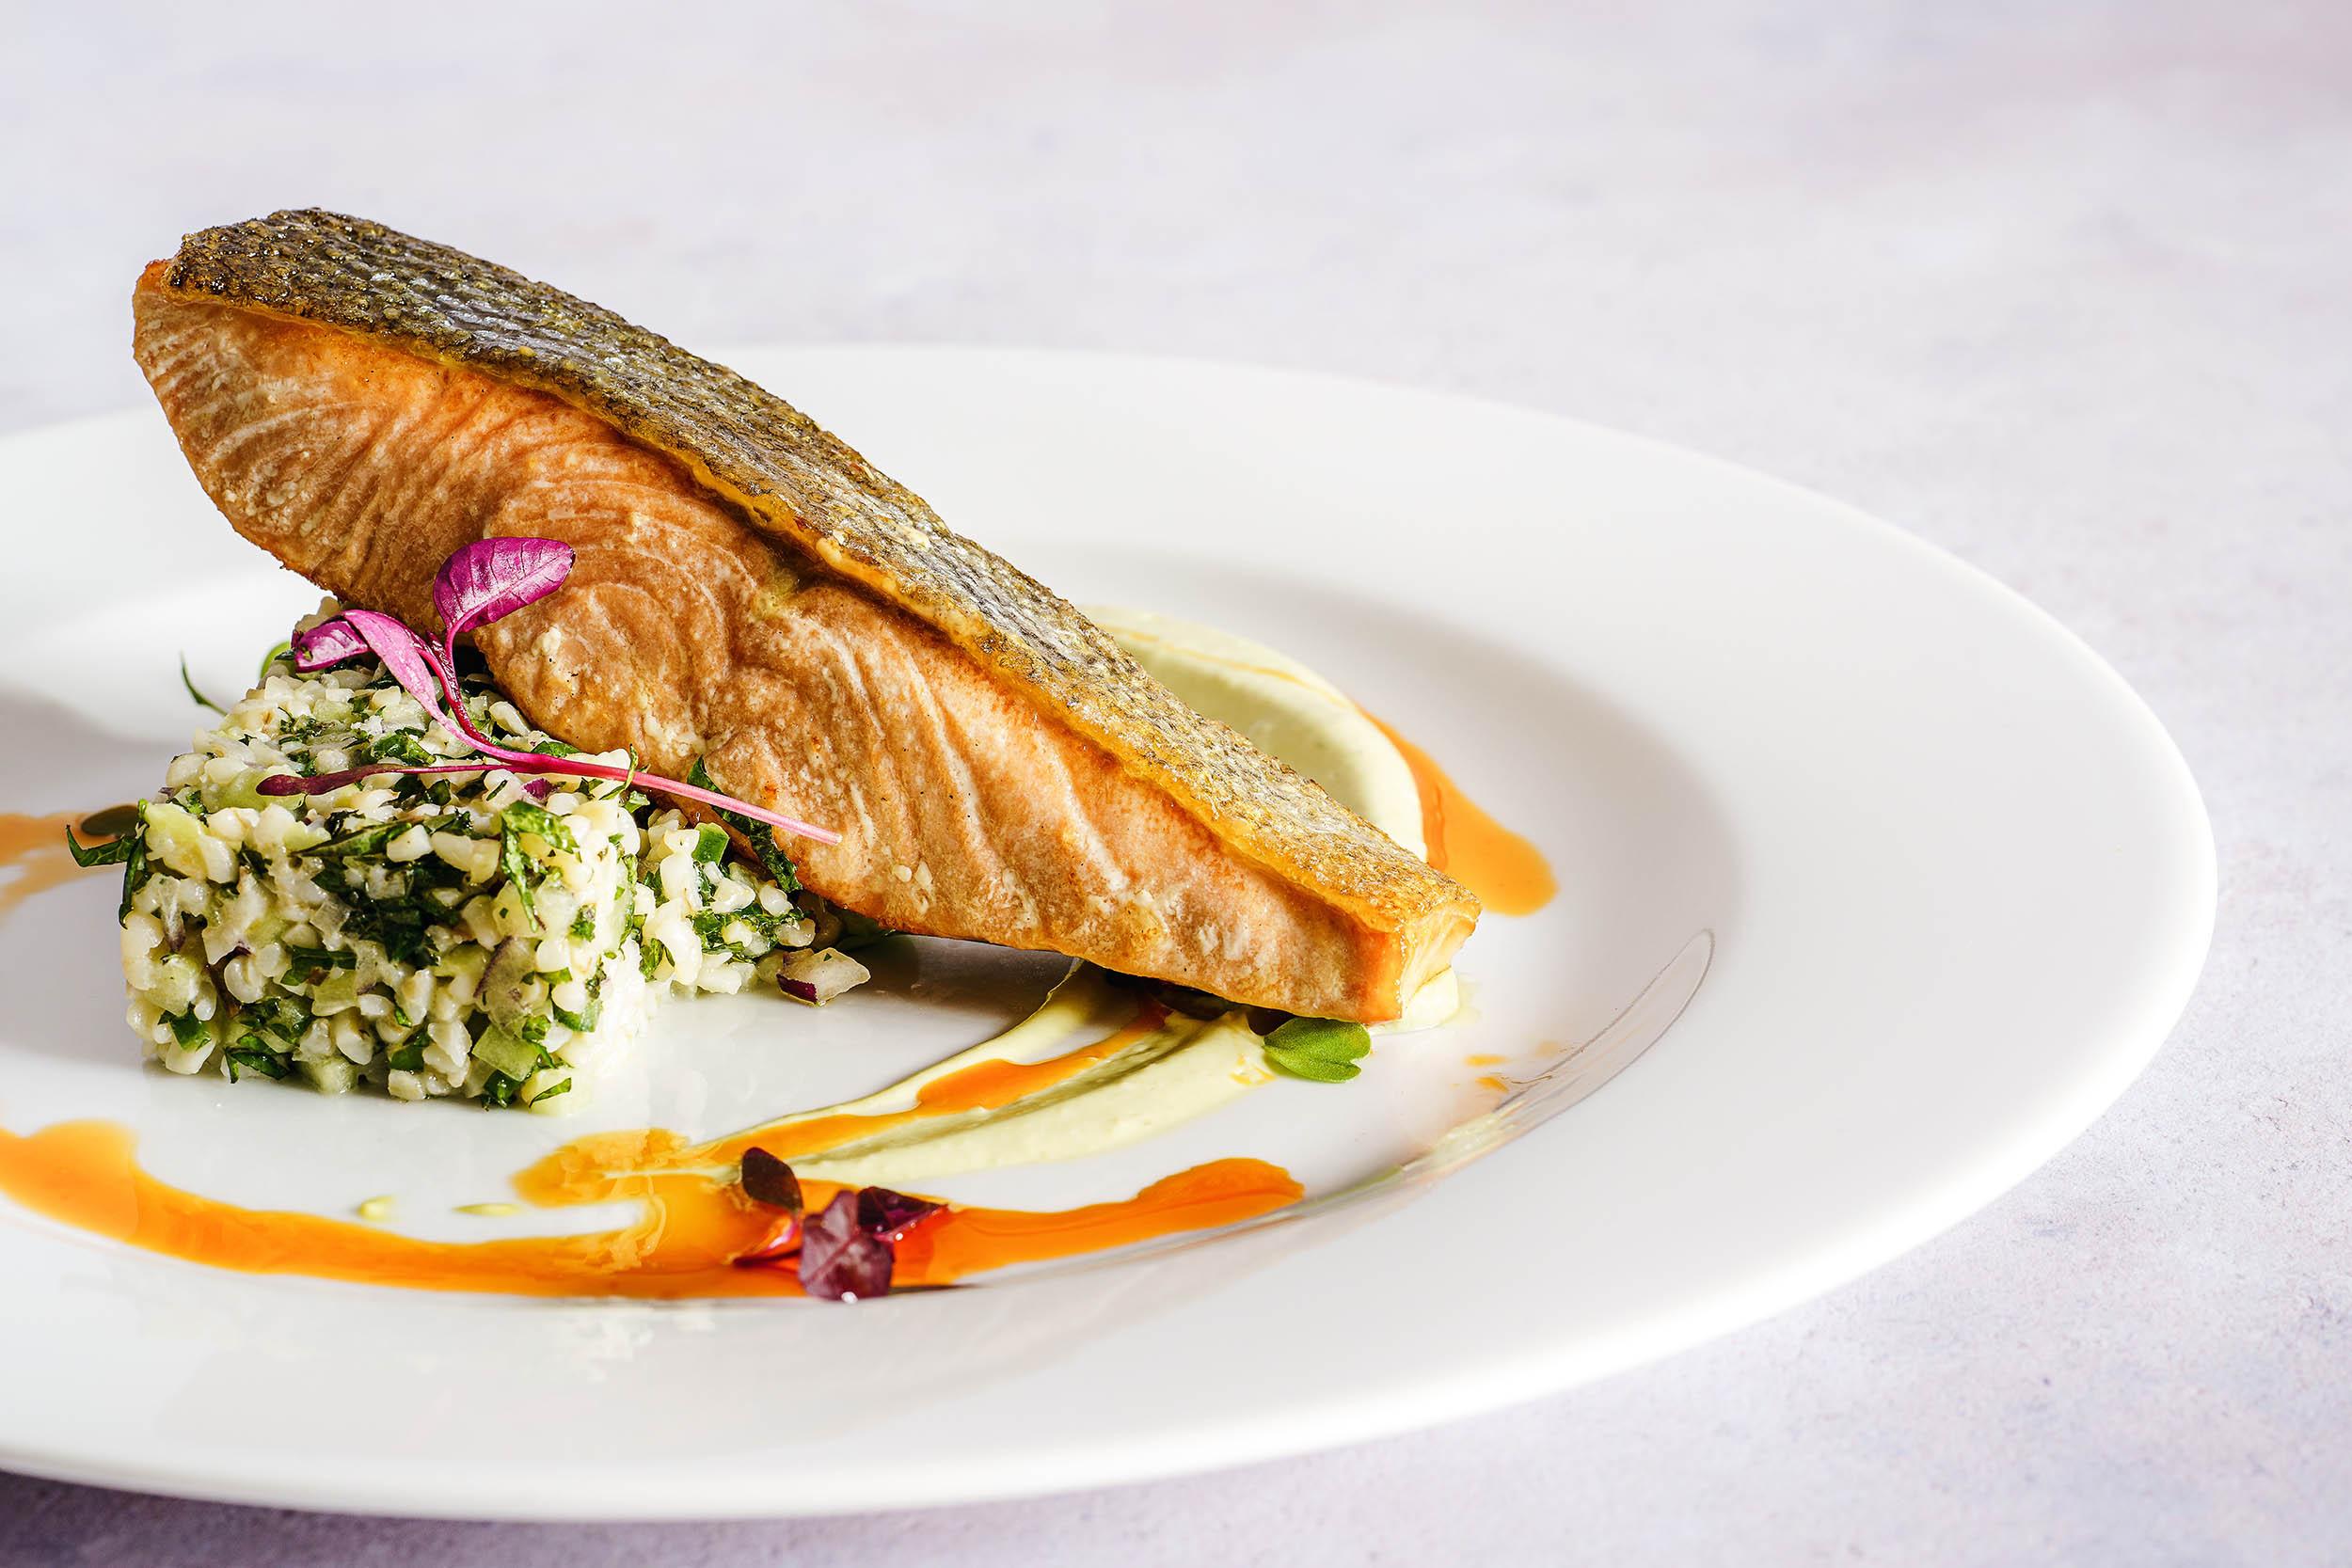 food quer ps blog 01 Food Photography Restaurant Photography Basics